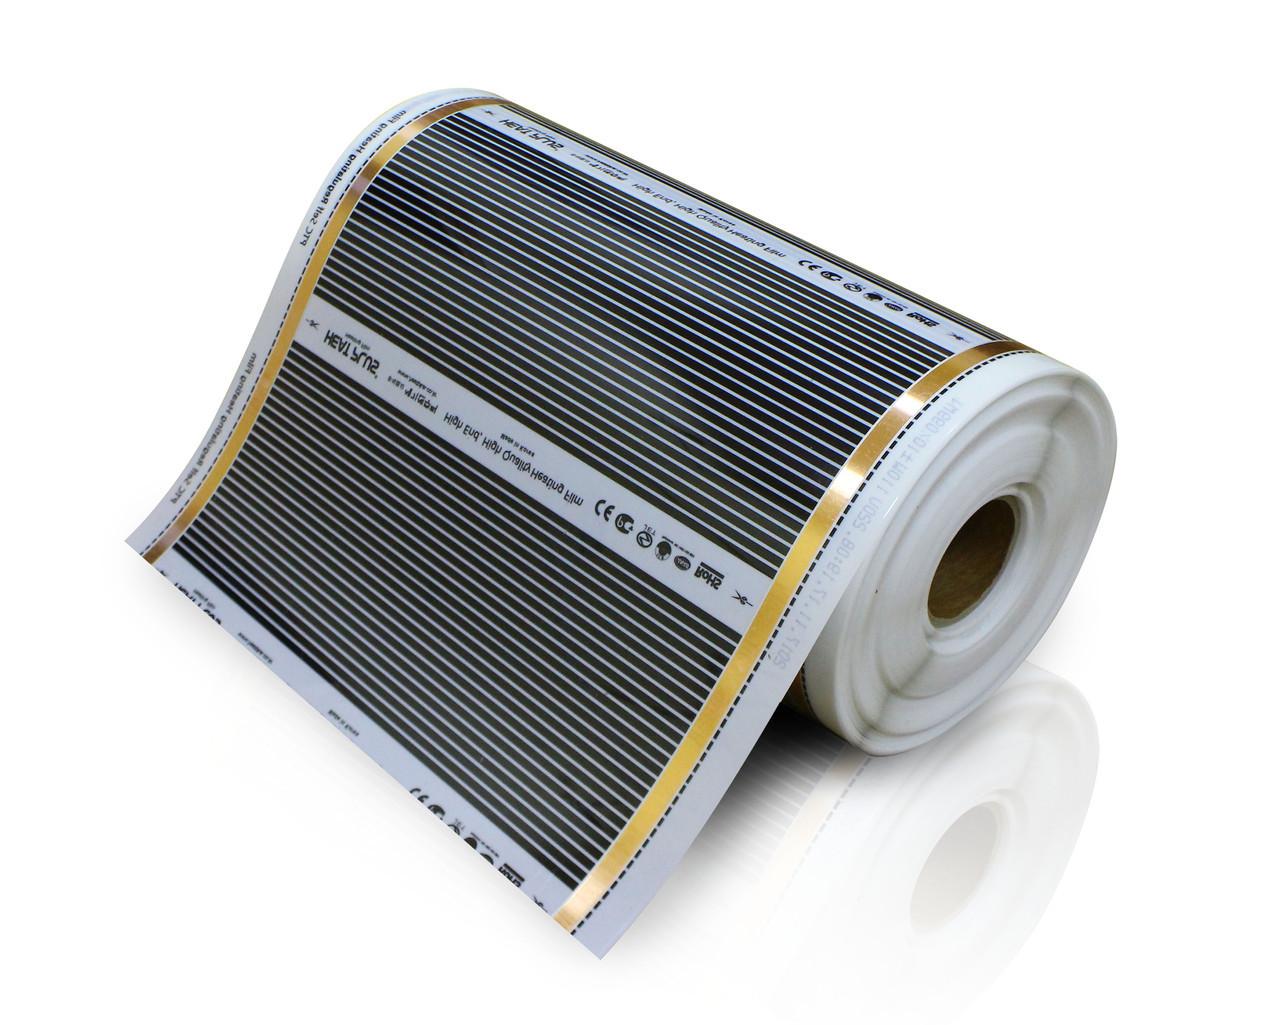 Инфракрасная плёнка Heat Plus SPР-305-110 РТС